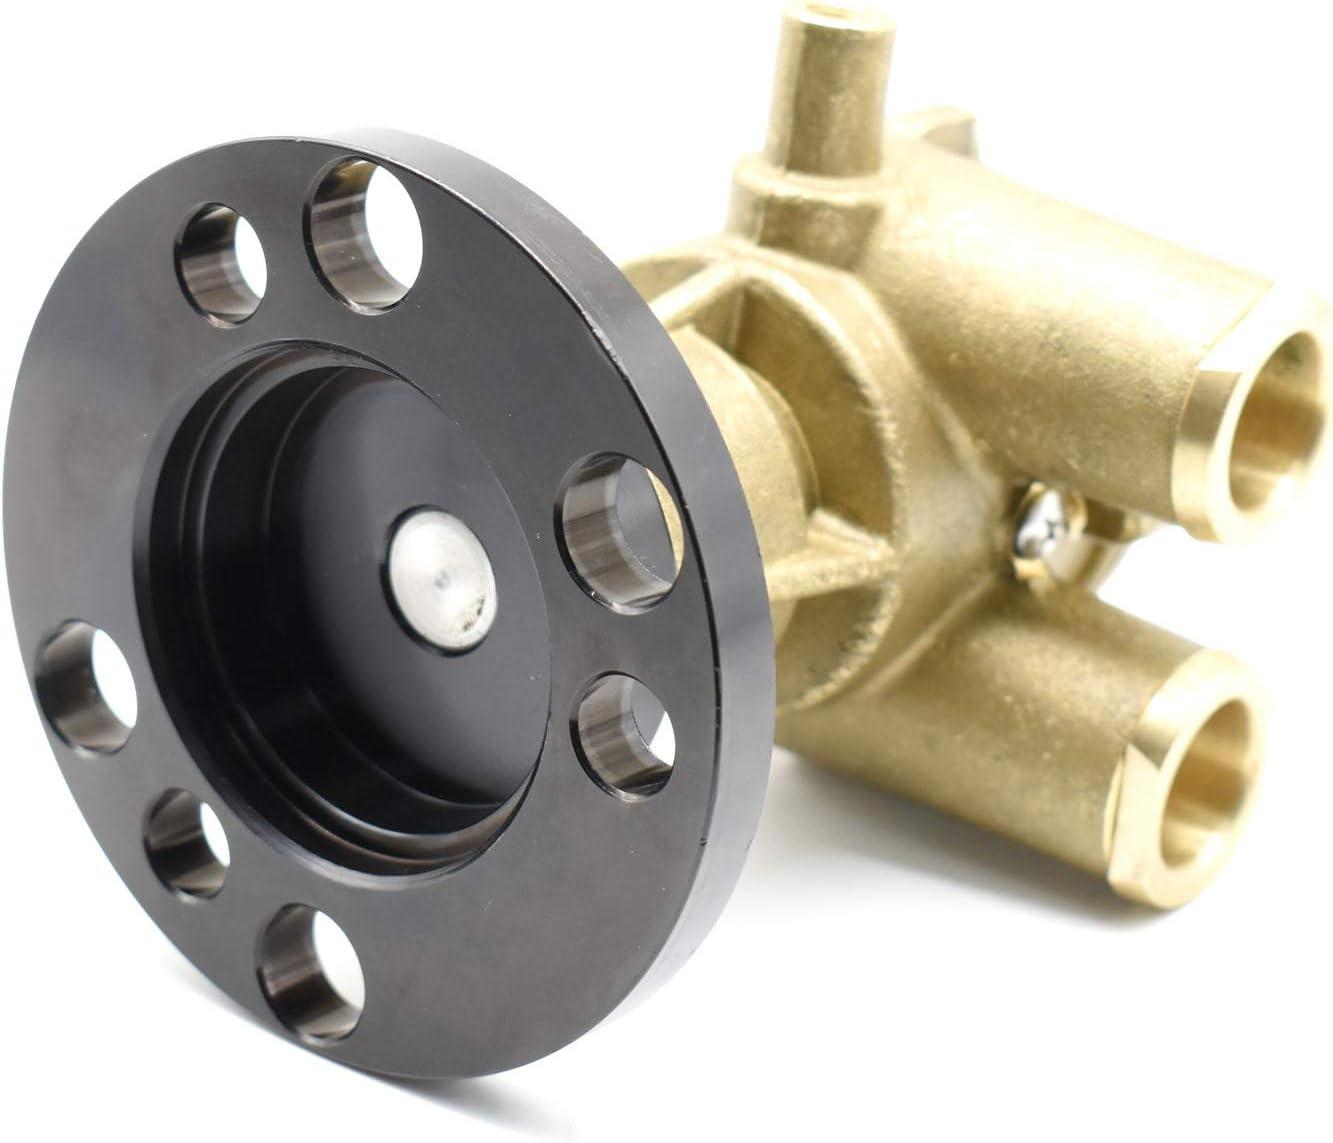 F6B-9 Crankshaft Mounted Impeller Water Pump for Volvo Penta 856513 3860703 and OMC V8 Engines Johnson 10-24946-01 Sherwood P105 Jabsco 50410-1201 Indmar 685001